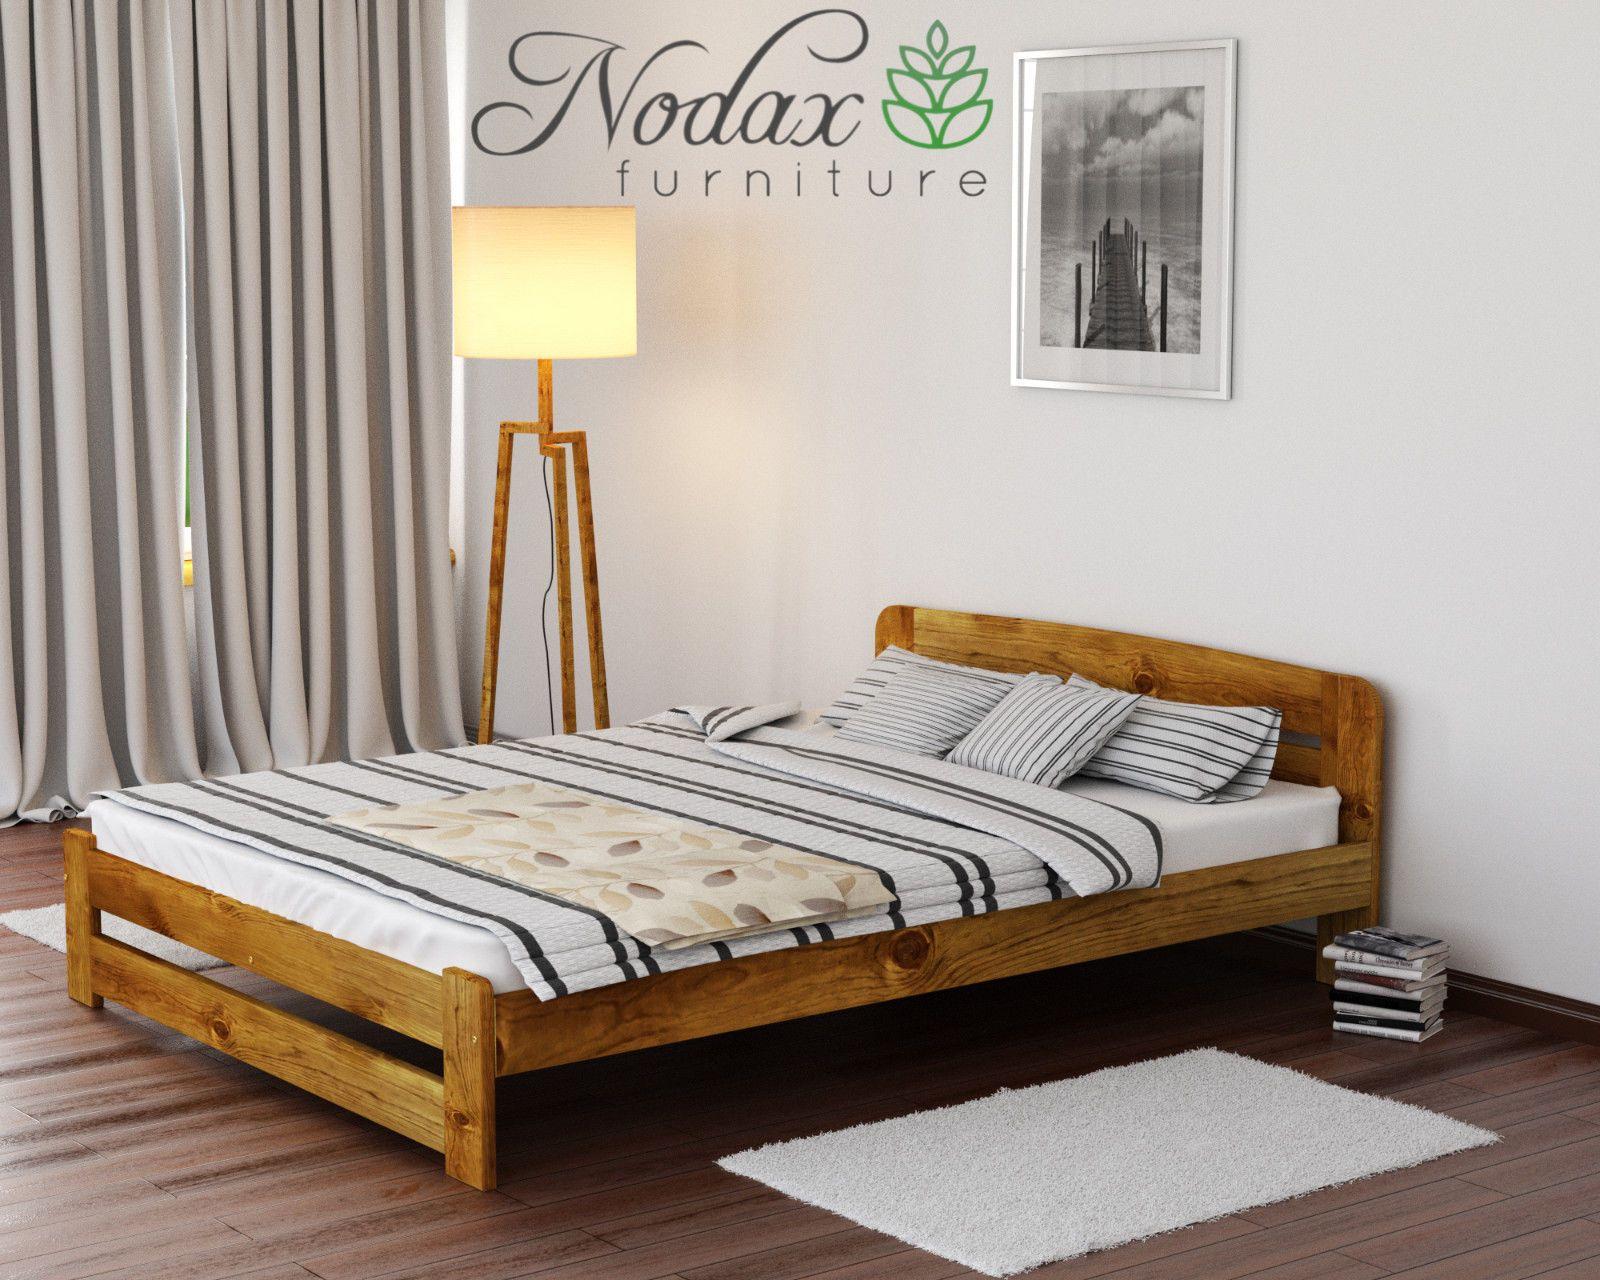 Brand New Solid Pine 5ft King Size Bed Frame & Slats WOODEN